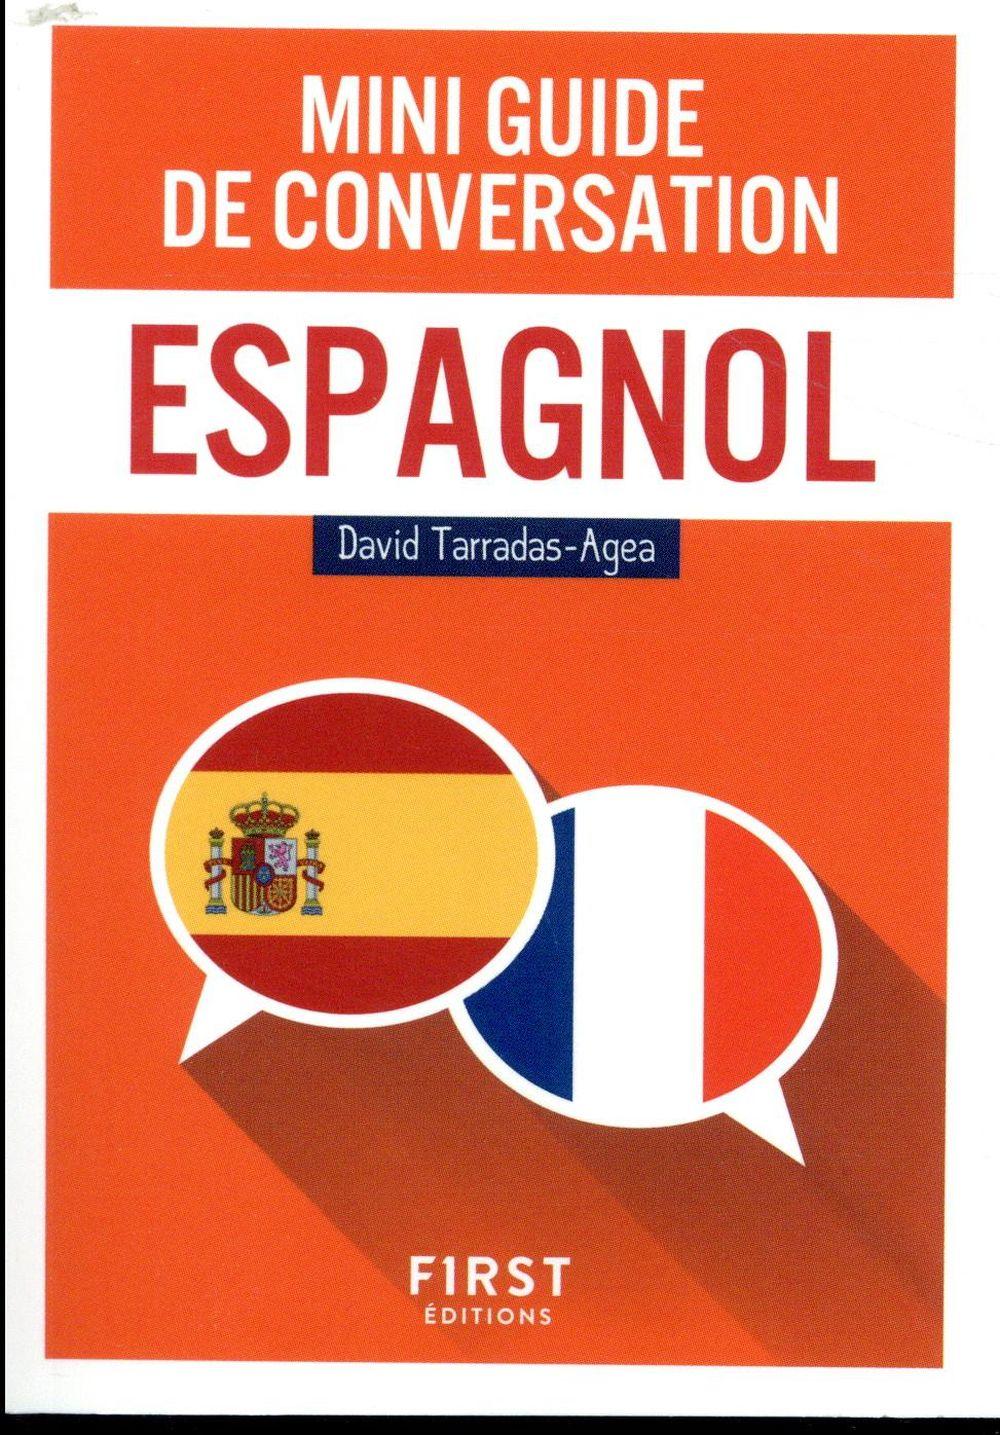 MINI GUIDE DE CONVERSATION ESPAGNOL